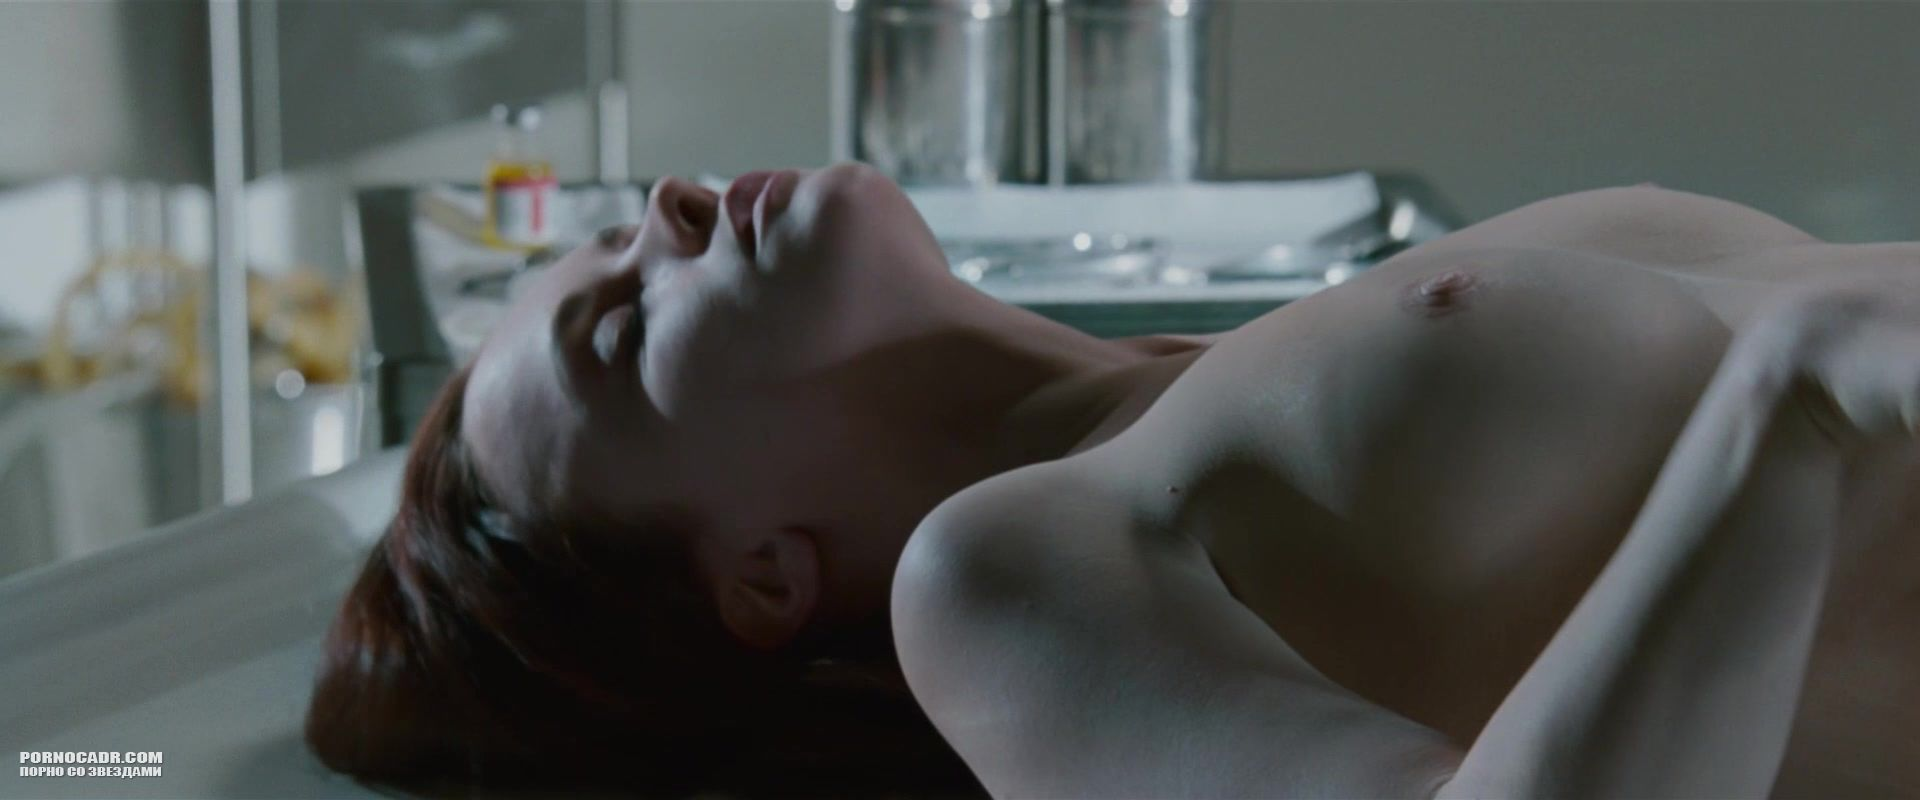 Latest christina ricci nude scene